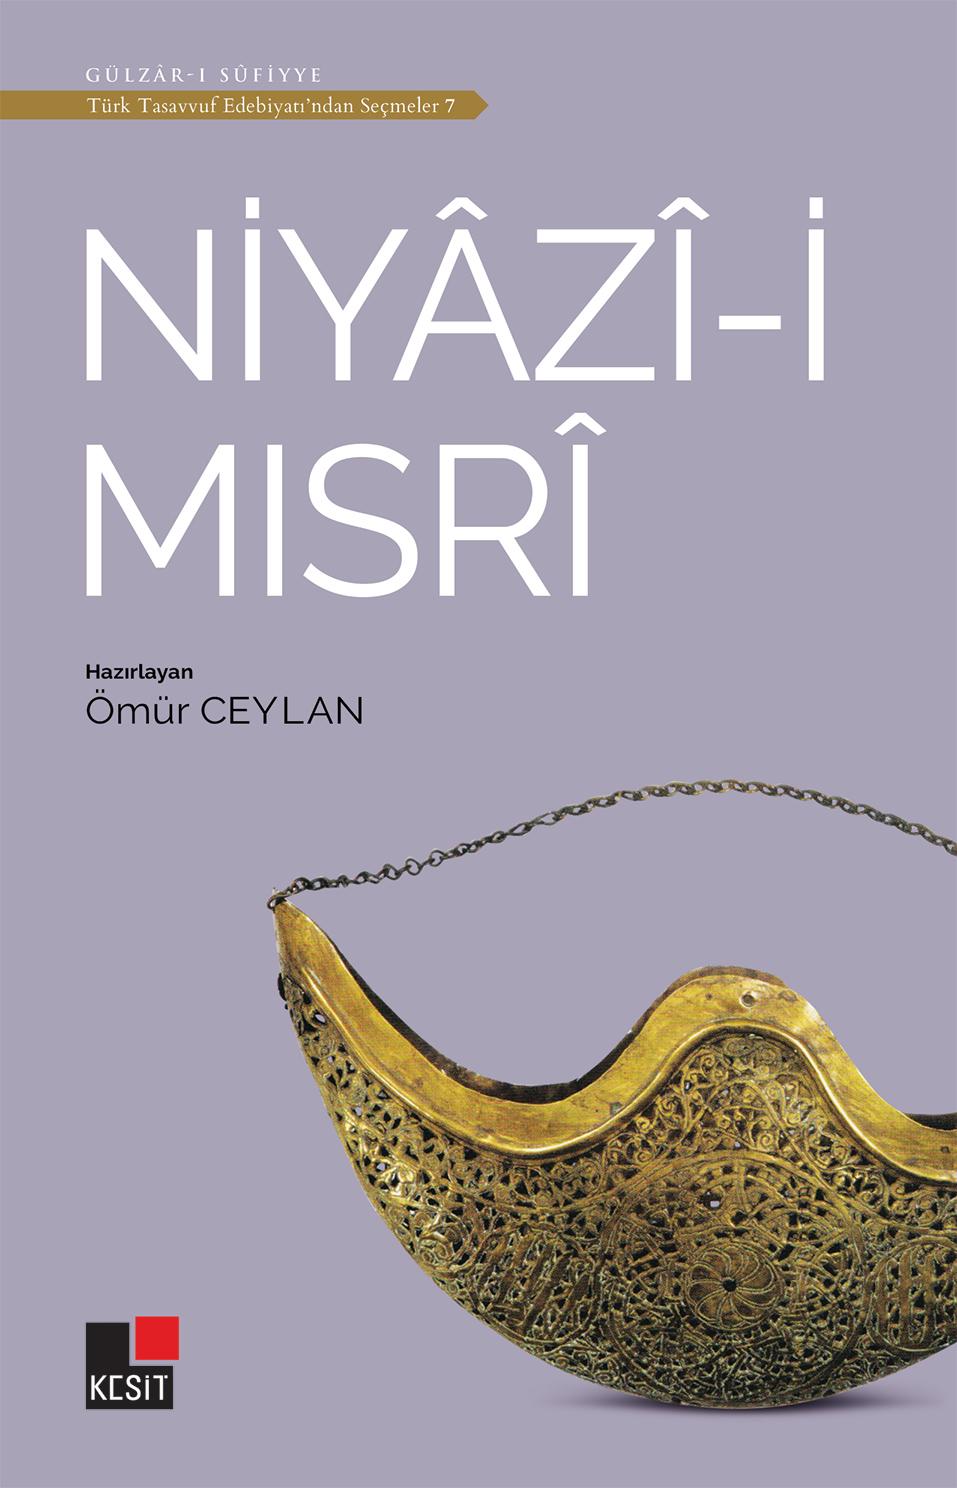 Niyâzî-i Mısrî / Türk tasavvuf edebiyatından seçmeler 7